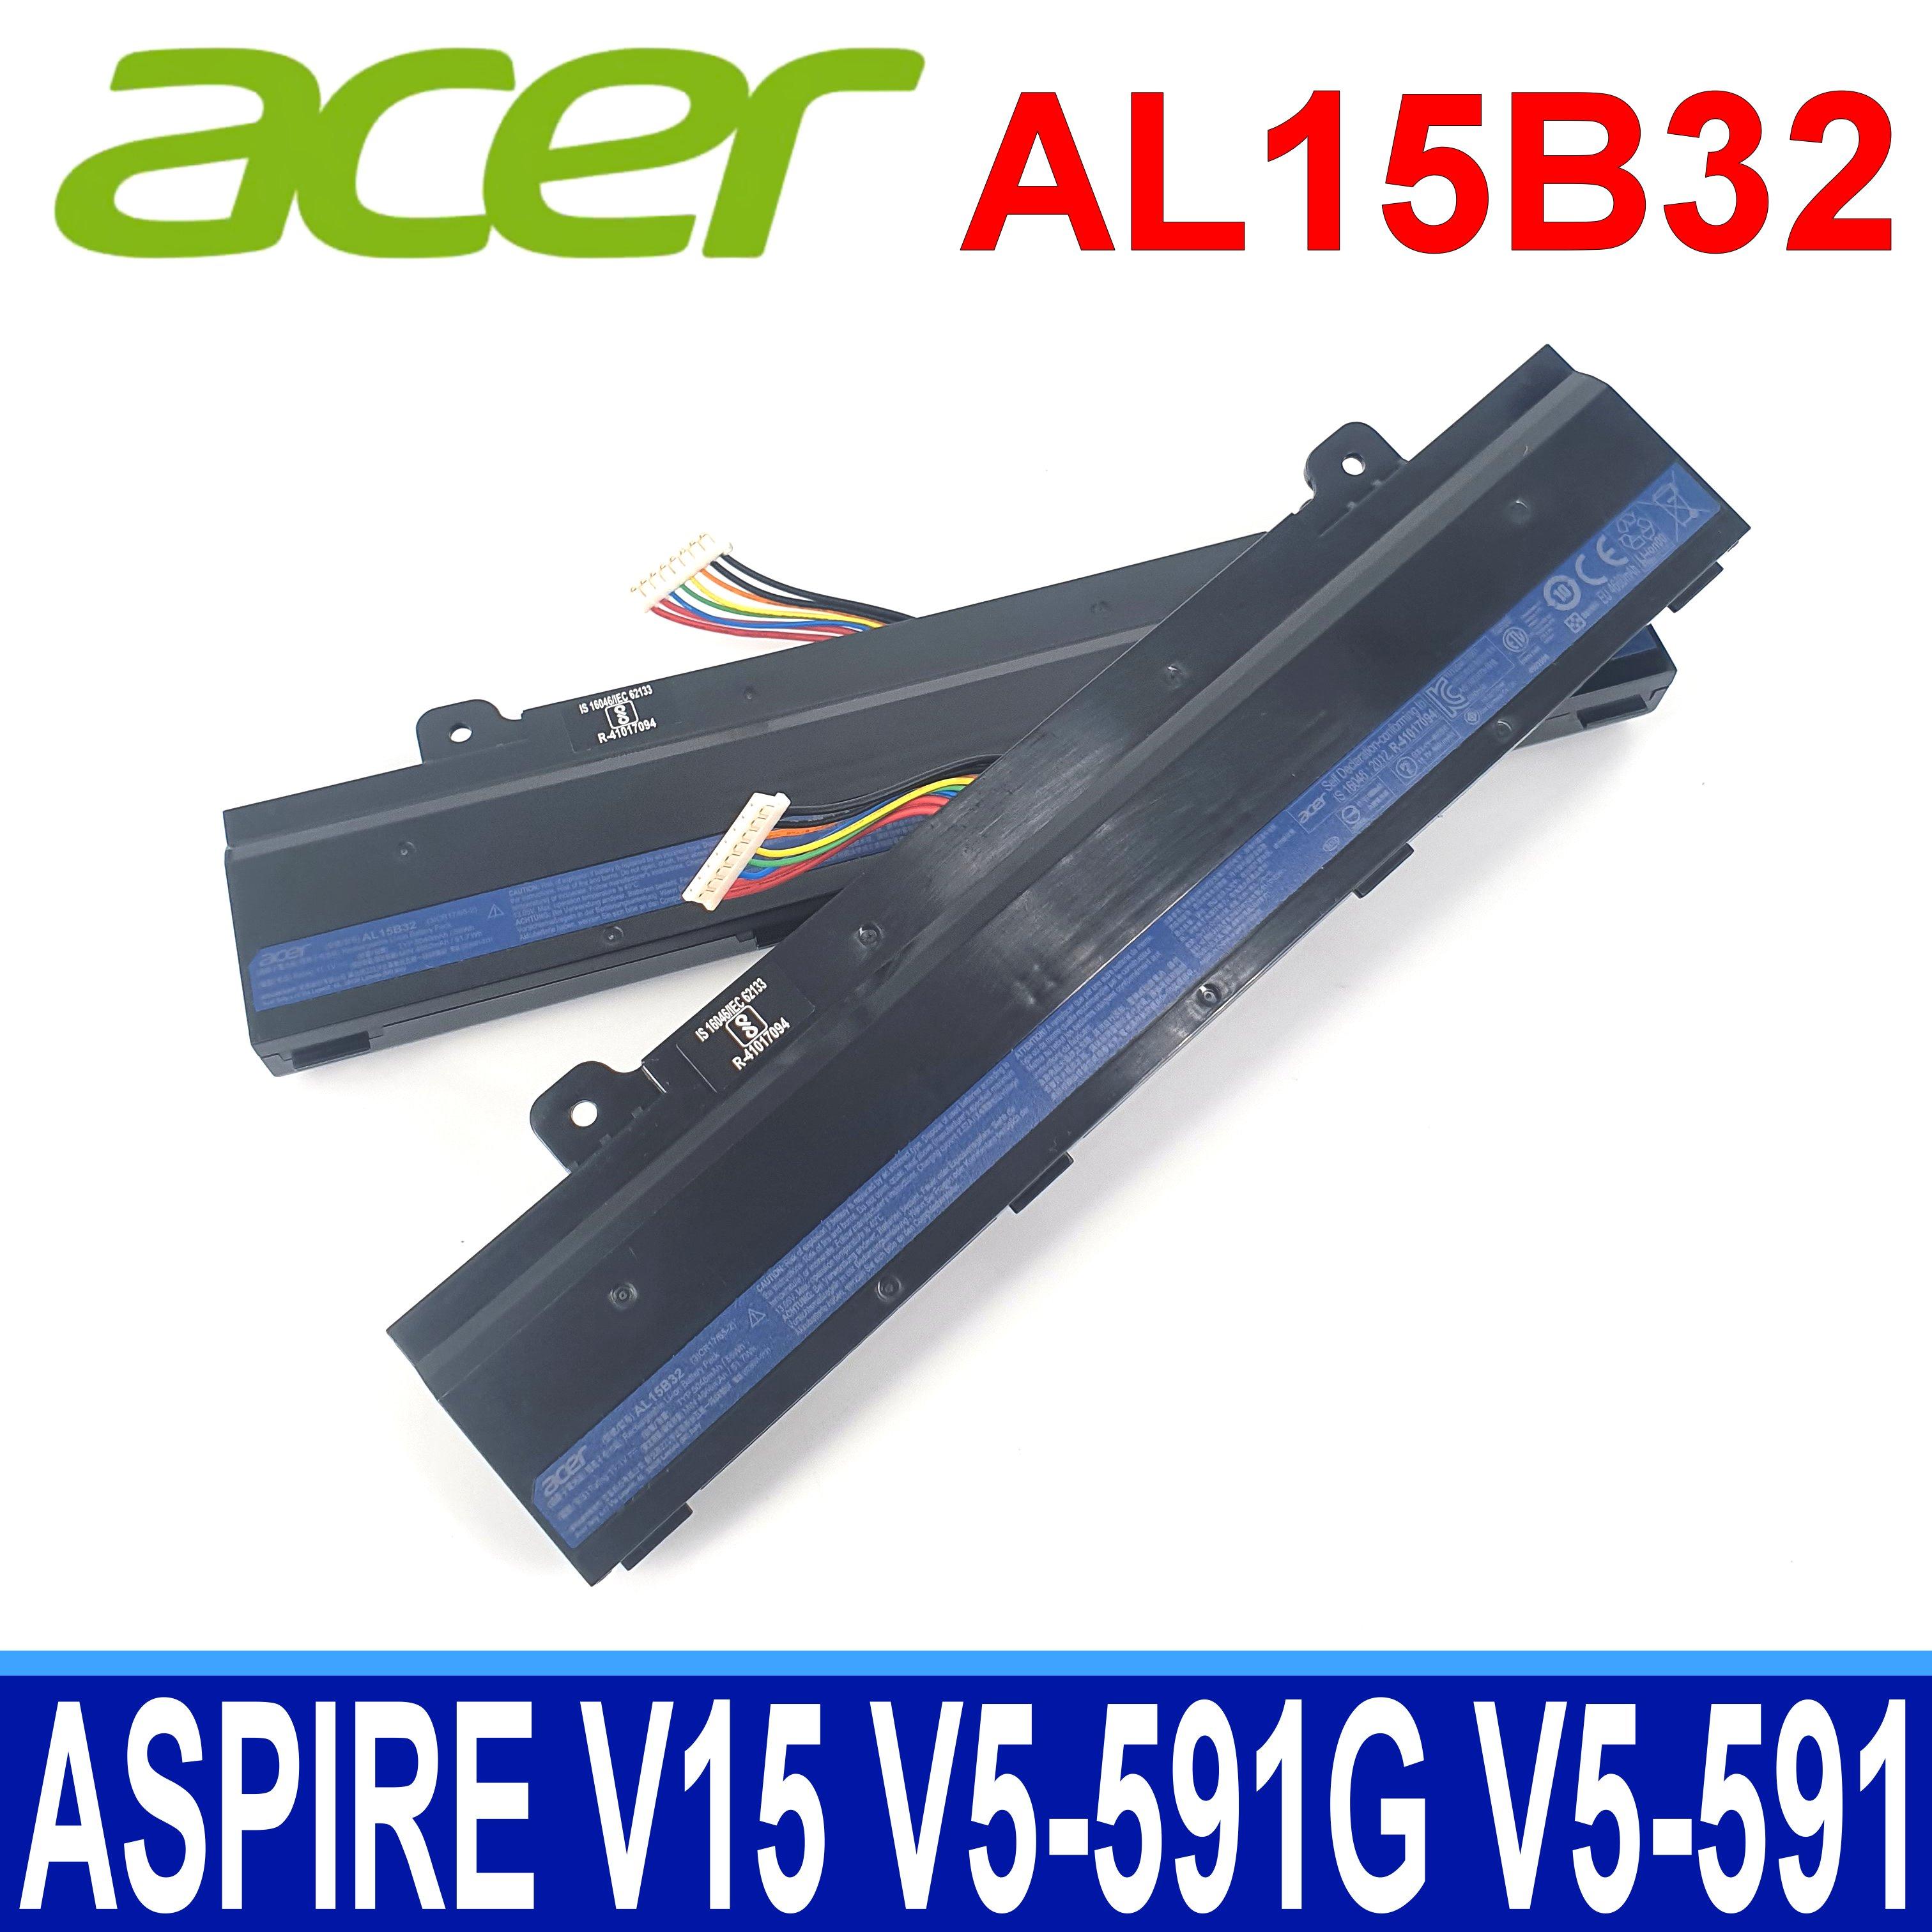 Acer AL15B32 原廠電池 Aspire V15 V5-591G V5-591 V5-591G-58ZRG,E5-772,E5-772G,TMP257 E5 E5-573 E5-573G E5-472G E5-473G E5-474G E5 E5-474 E5-474G